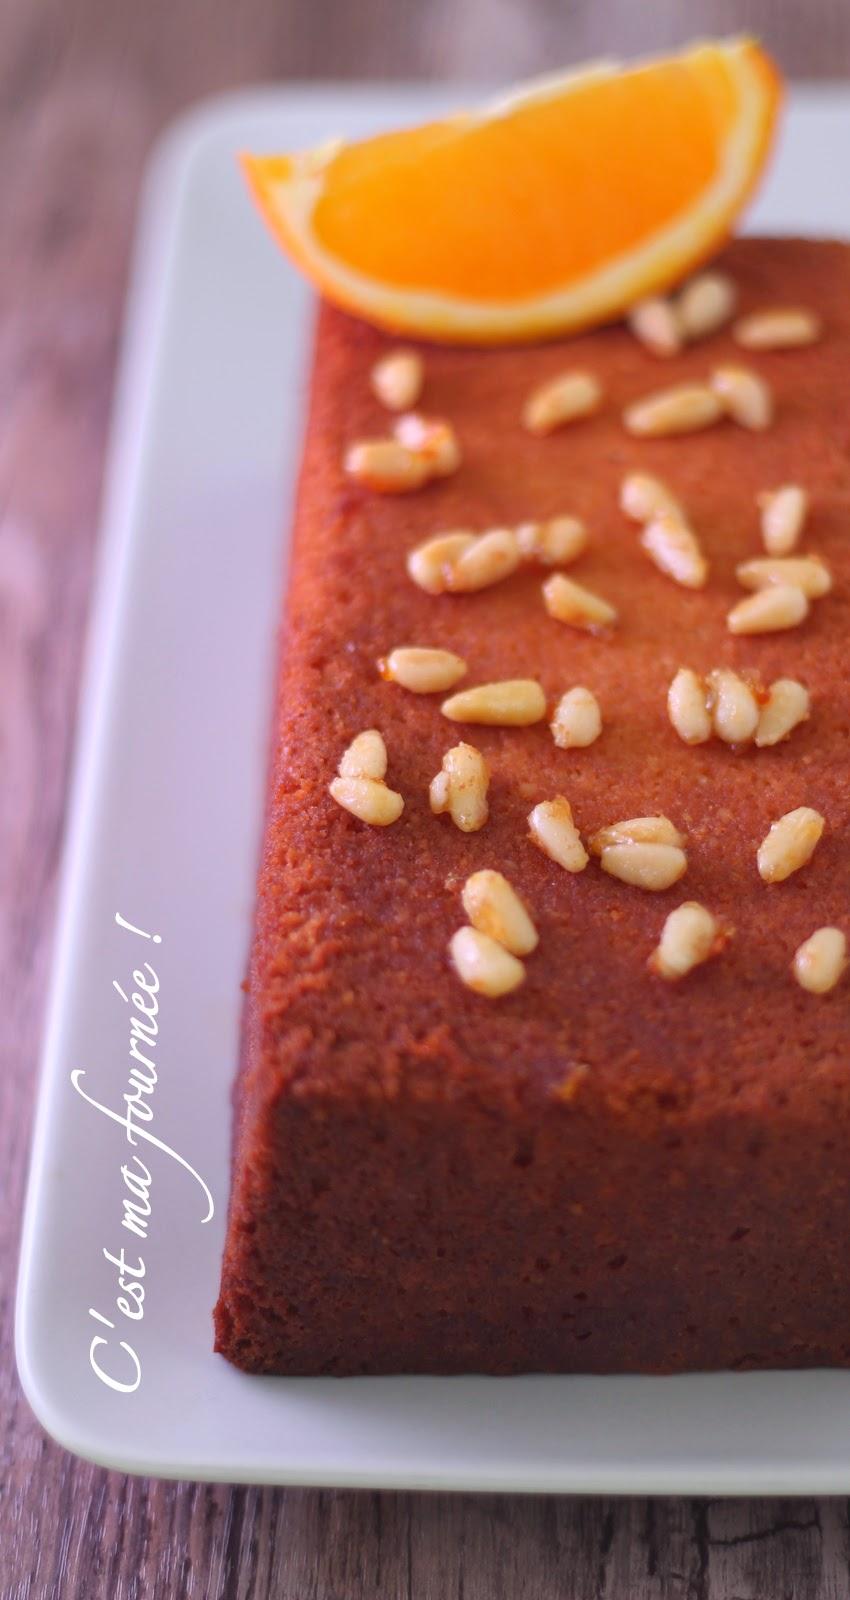 CAKE AUX AGRUMES MICHALAK